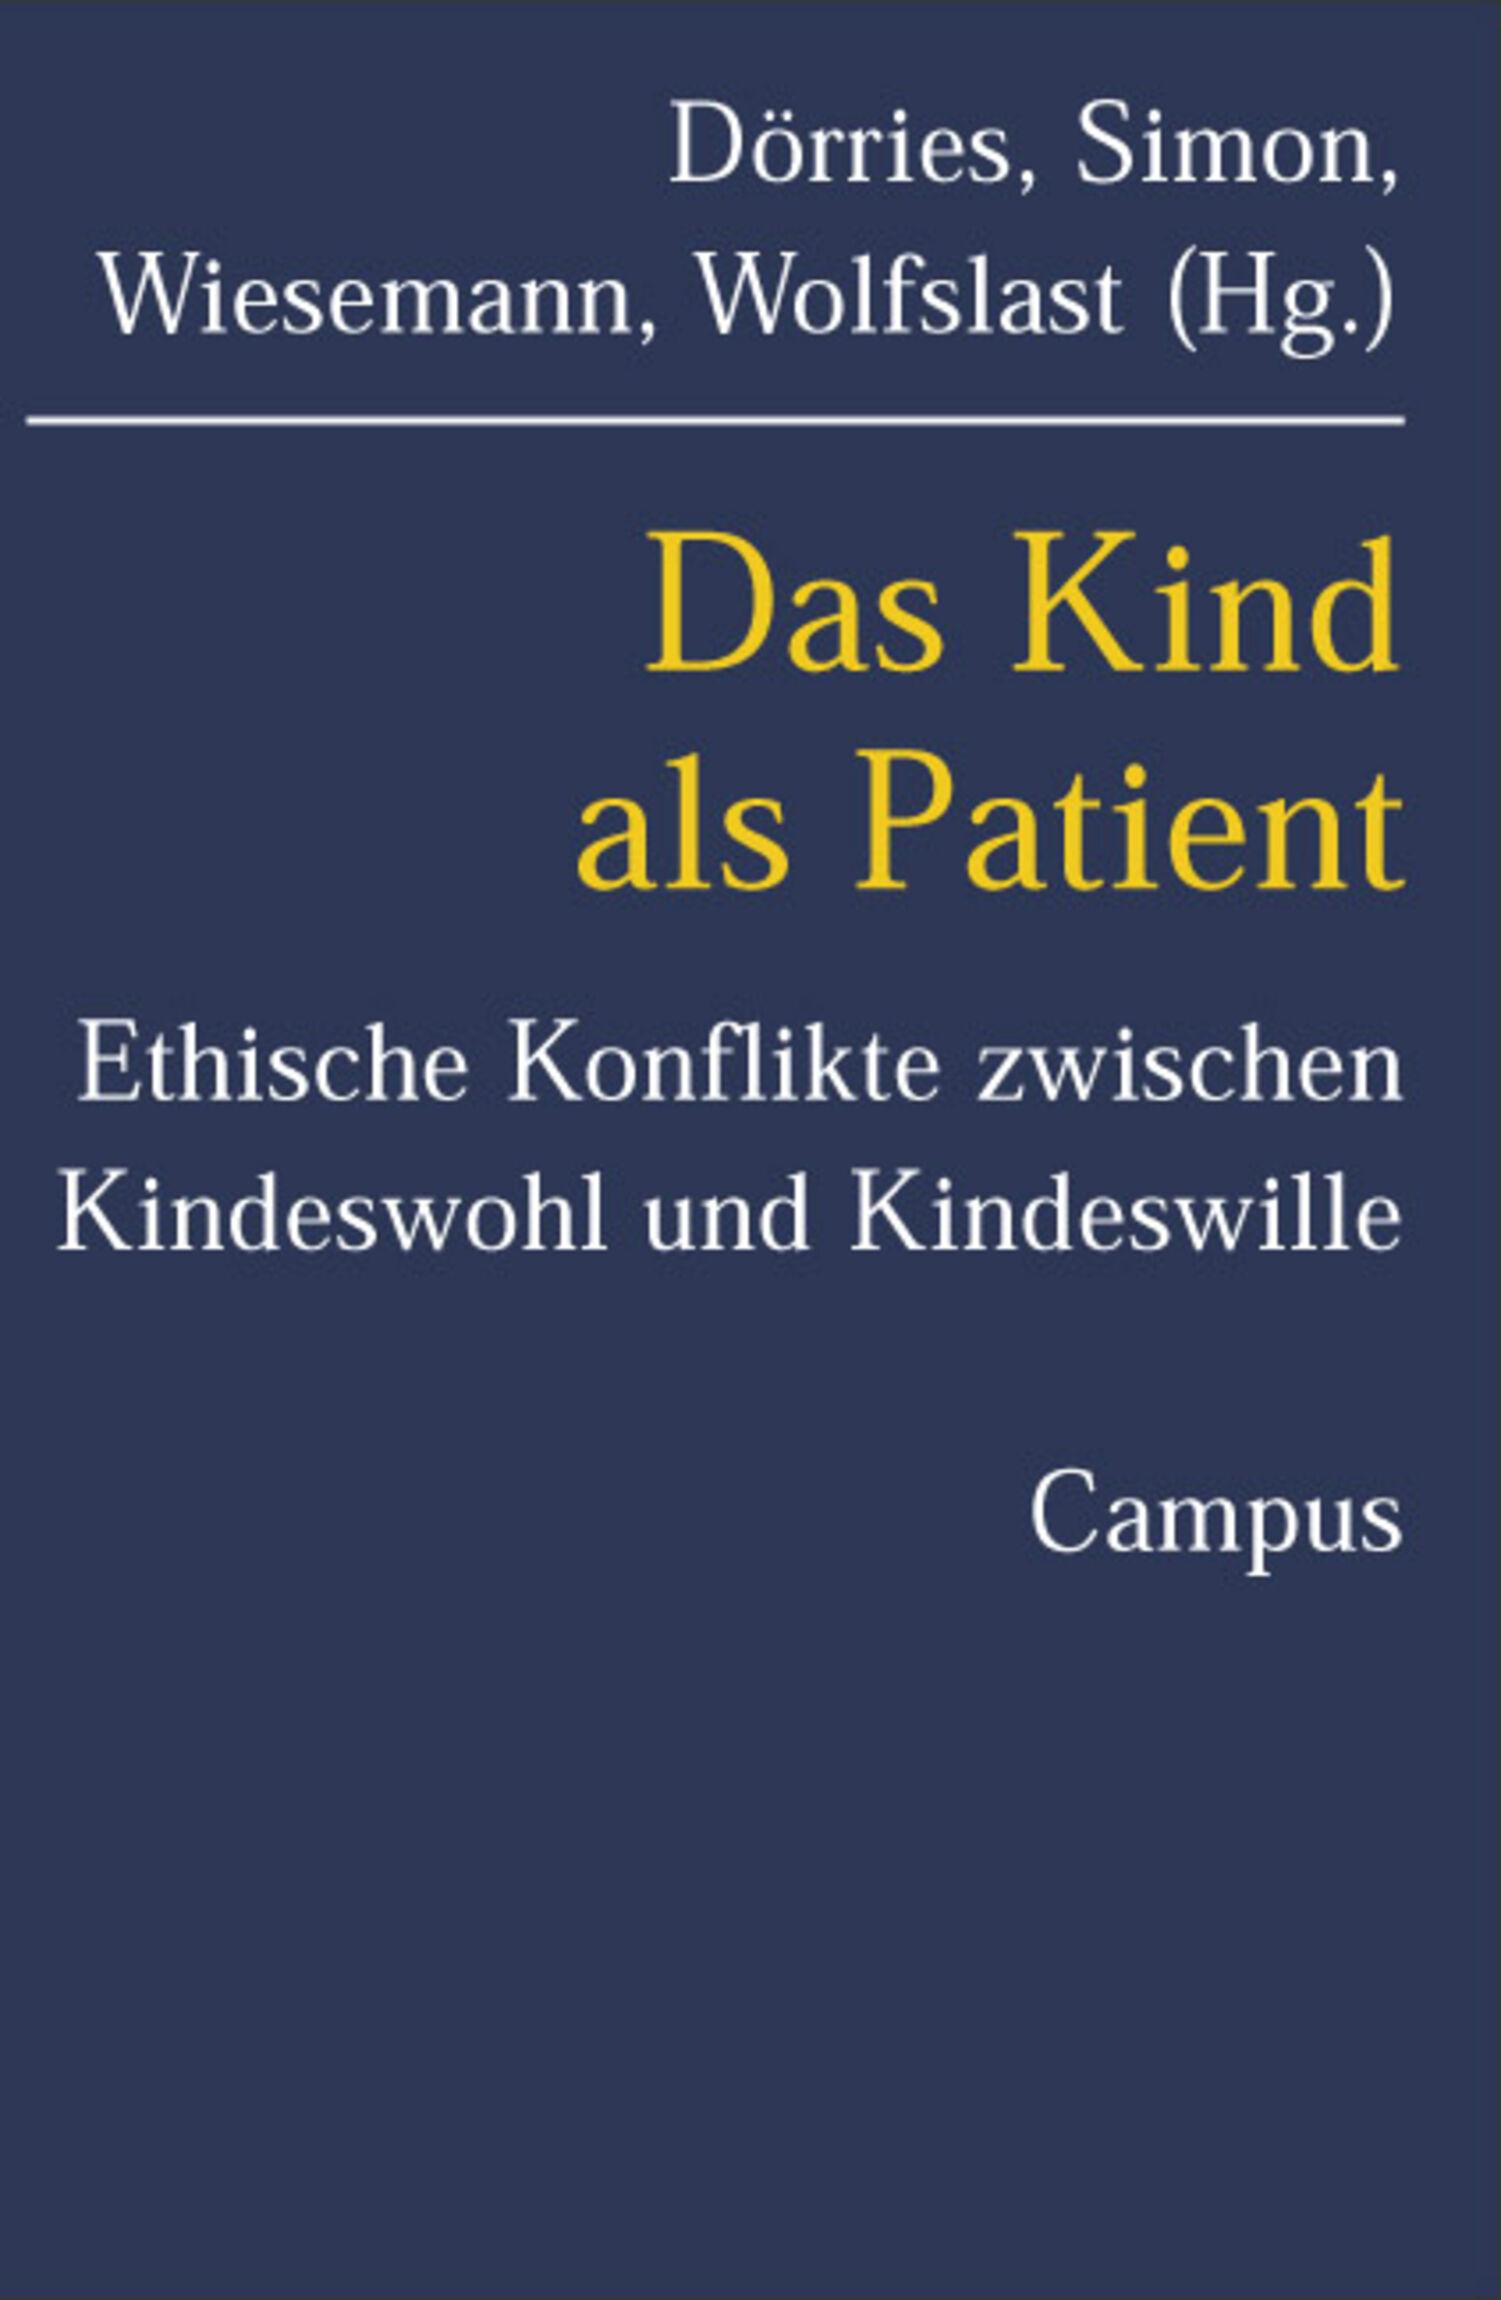 Das Kind als Patient Buchcover